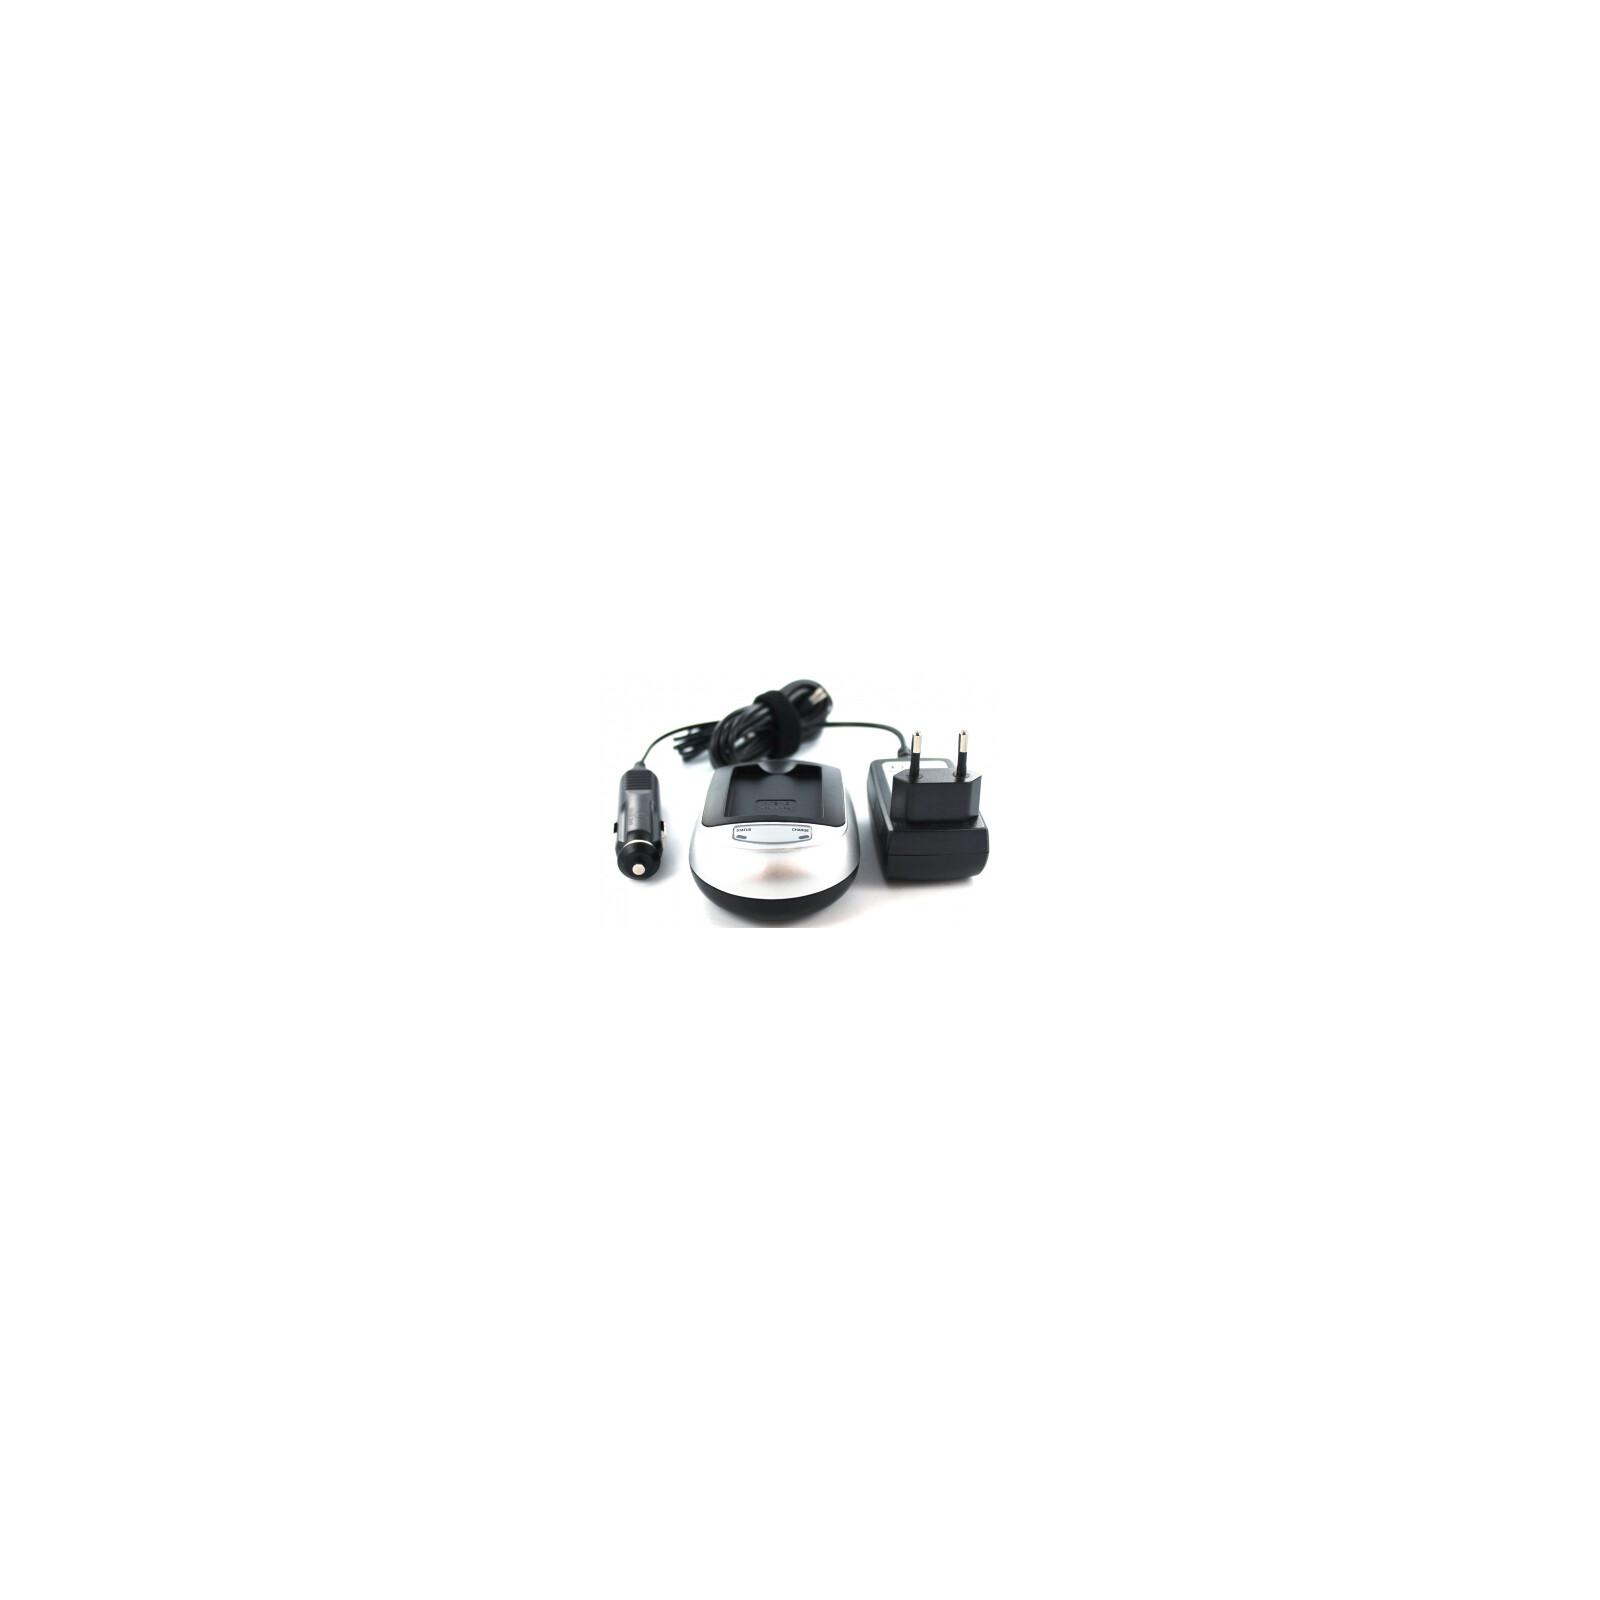 AGI 76778 Ladegerät Nikon D3100